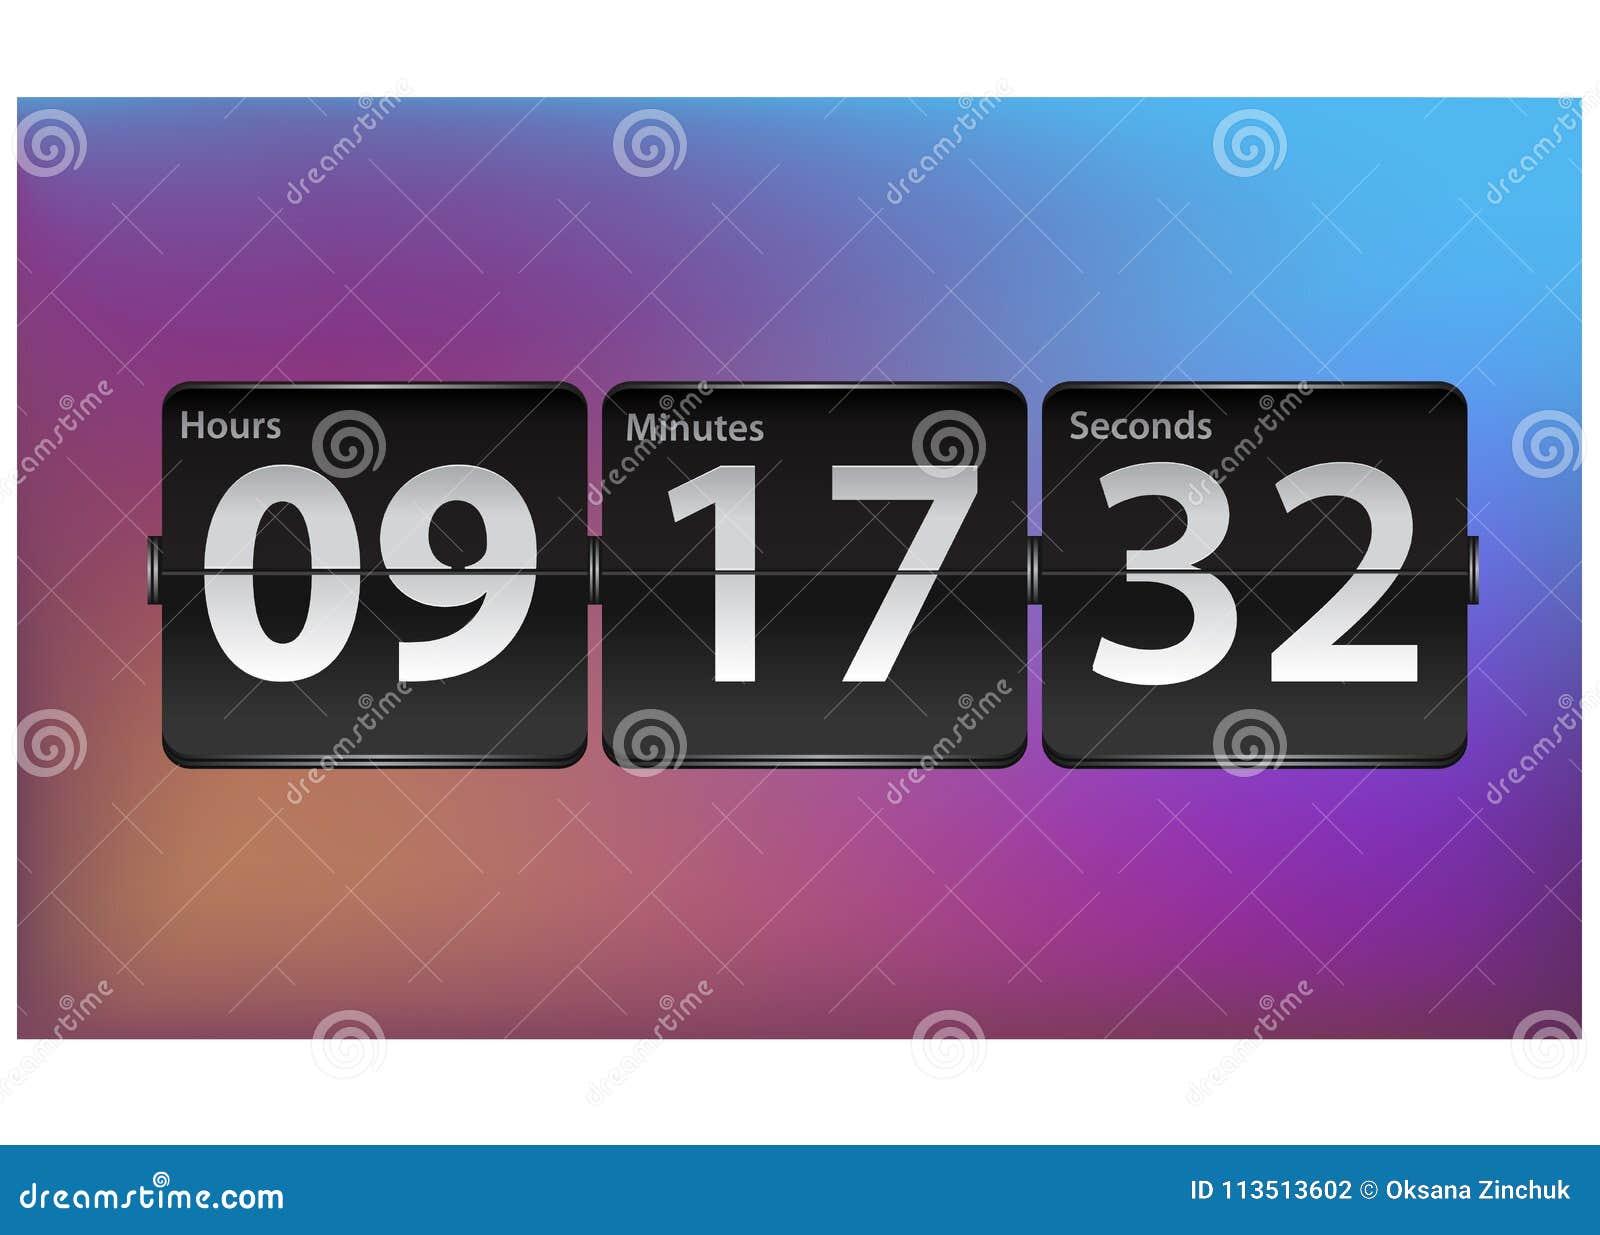 Flip Countdown Timer Template. Analog Clock Counter Design. Stock ...